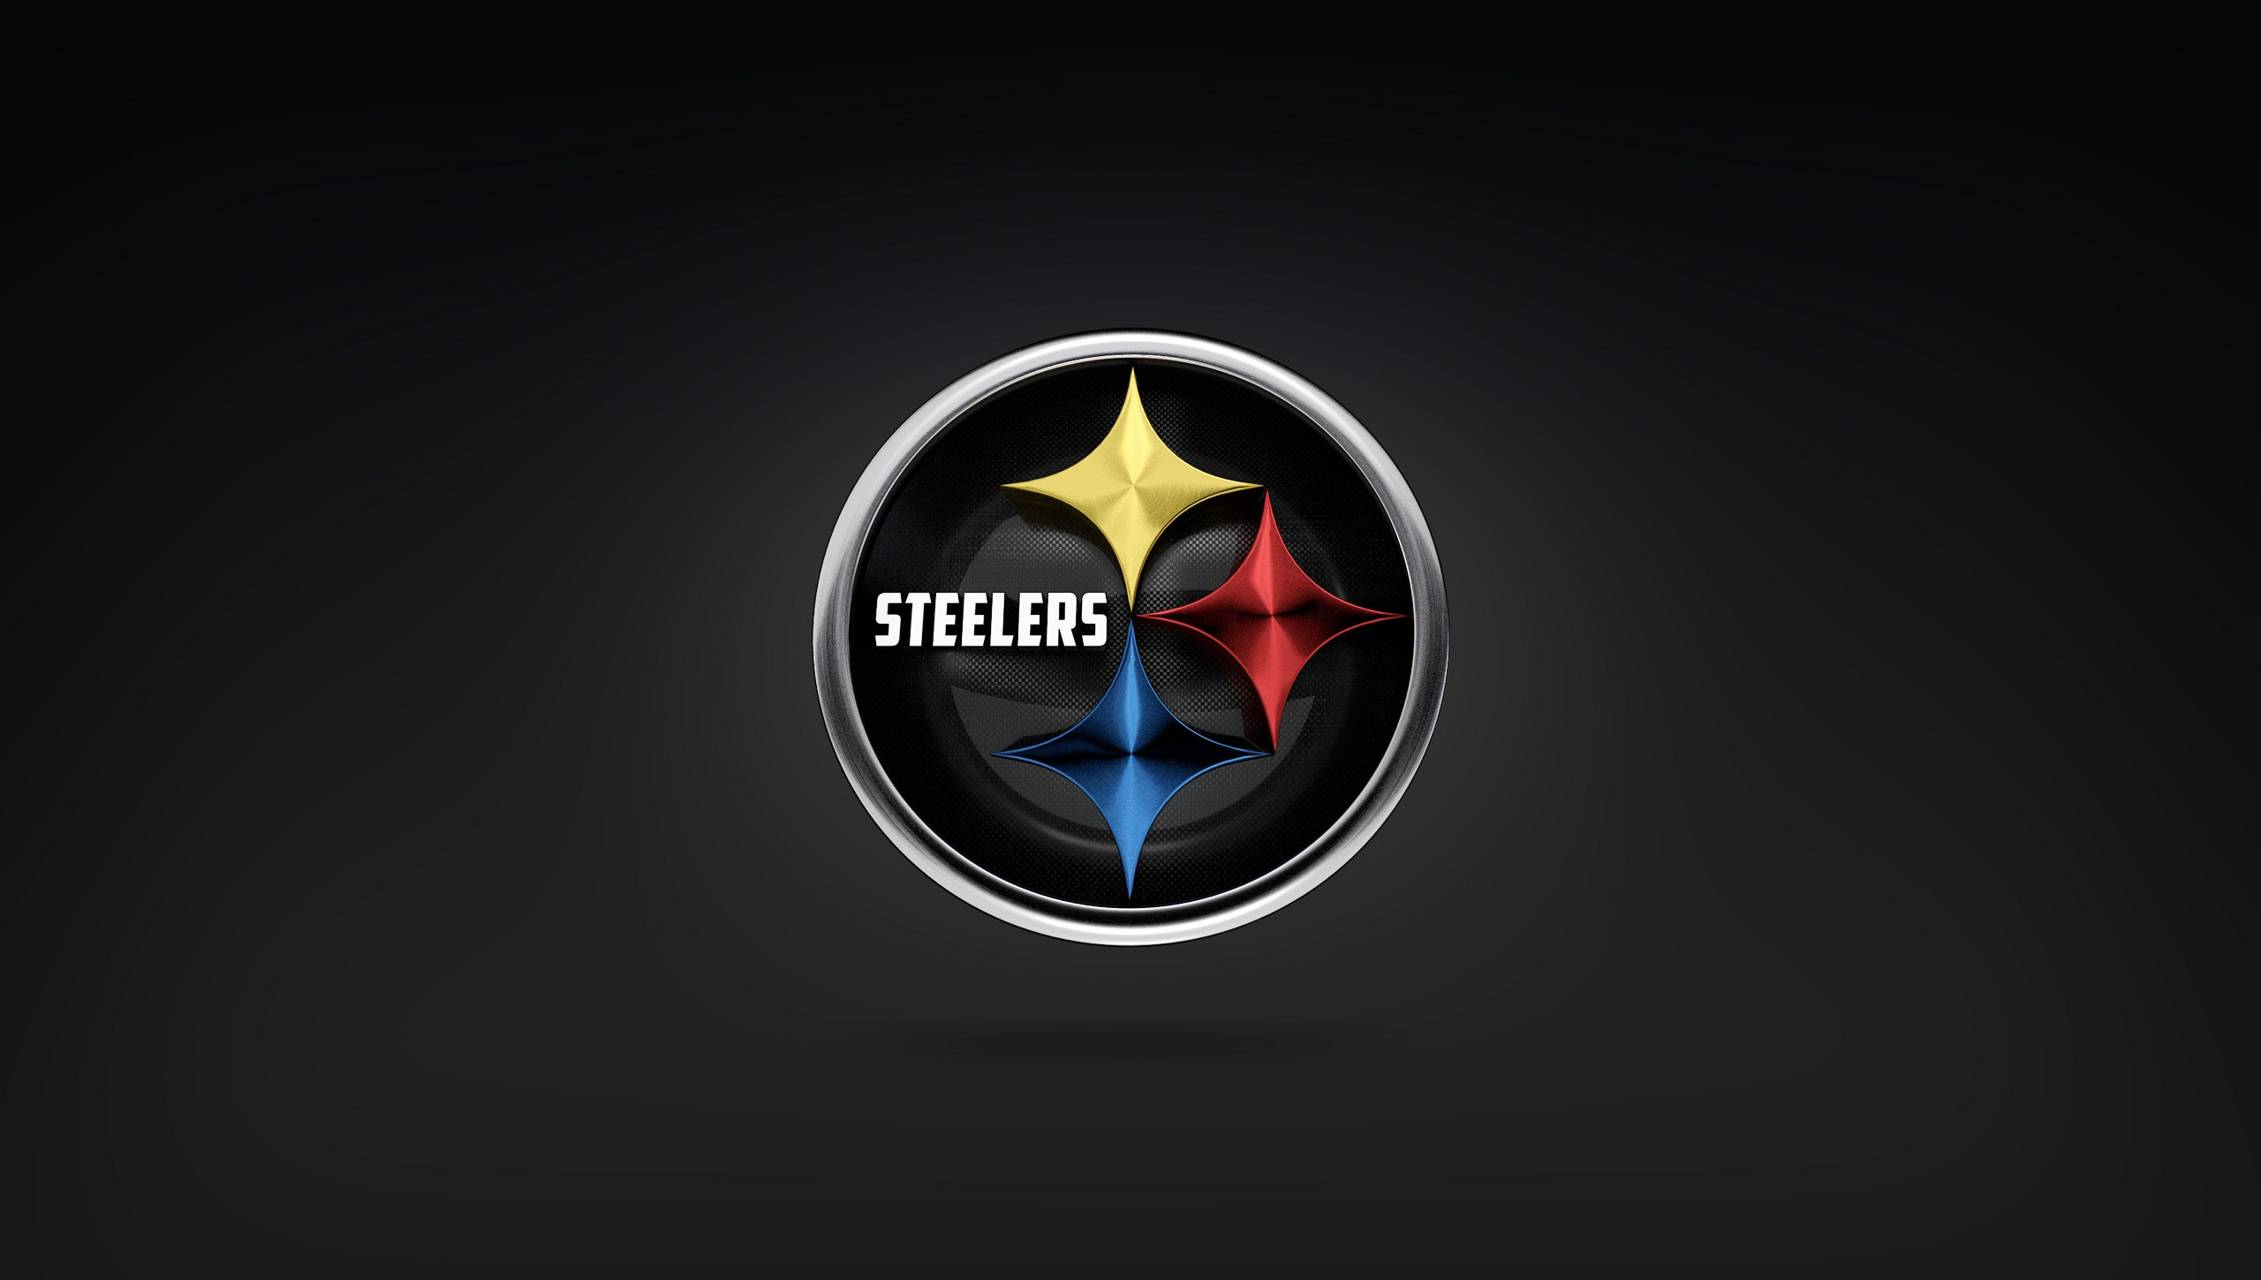 Steelers 3